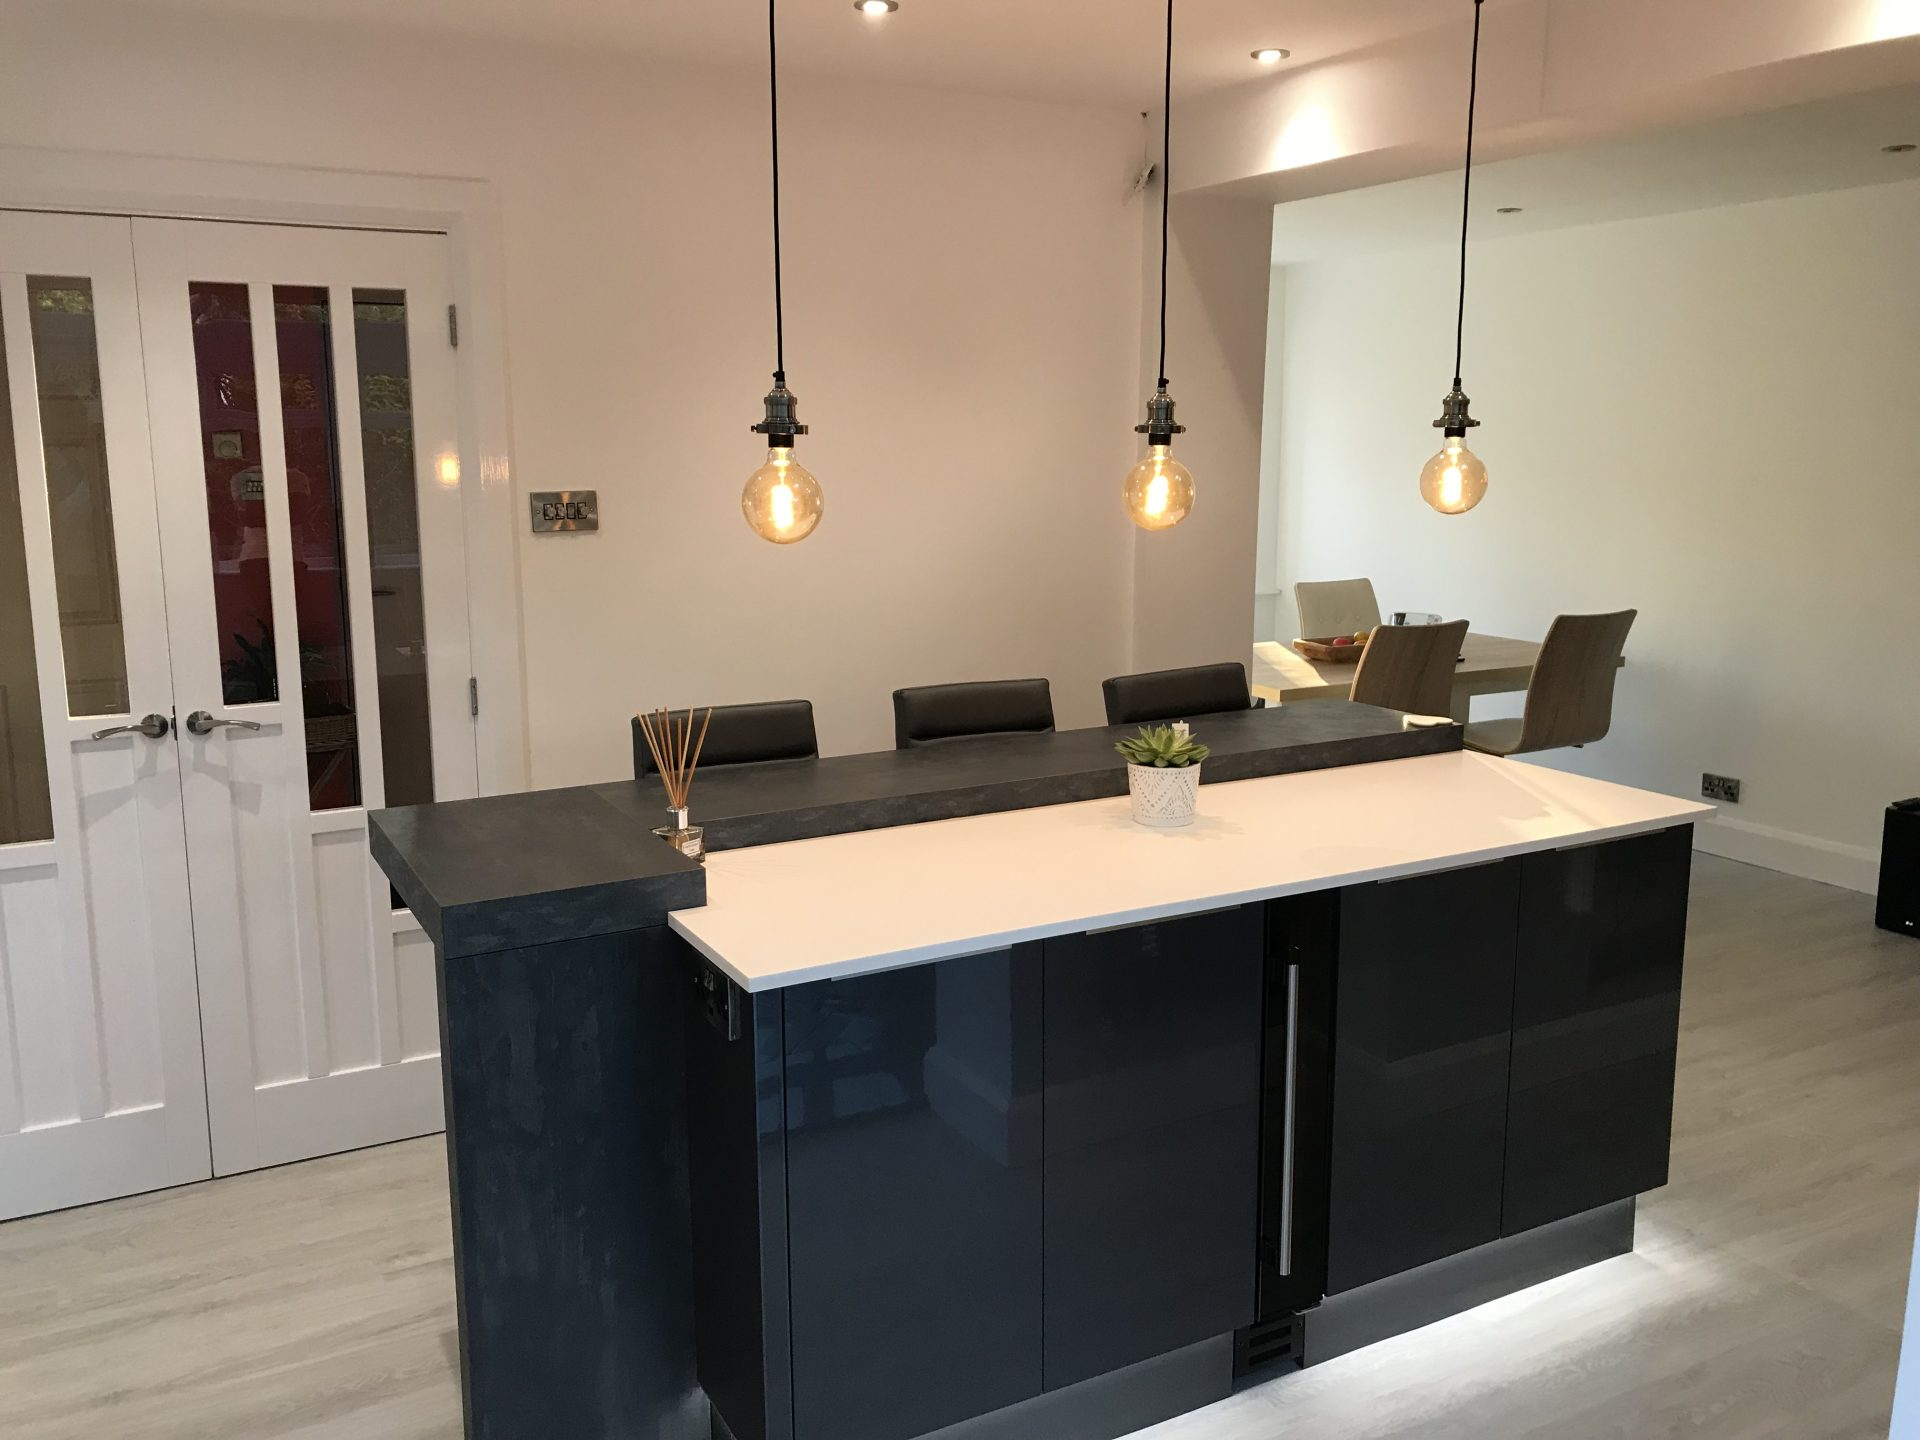 Contemporary Grey Anthracite kitchen with Island - Bratton, Telford